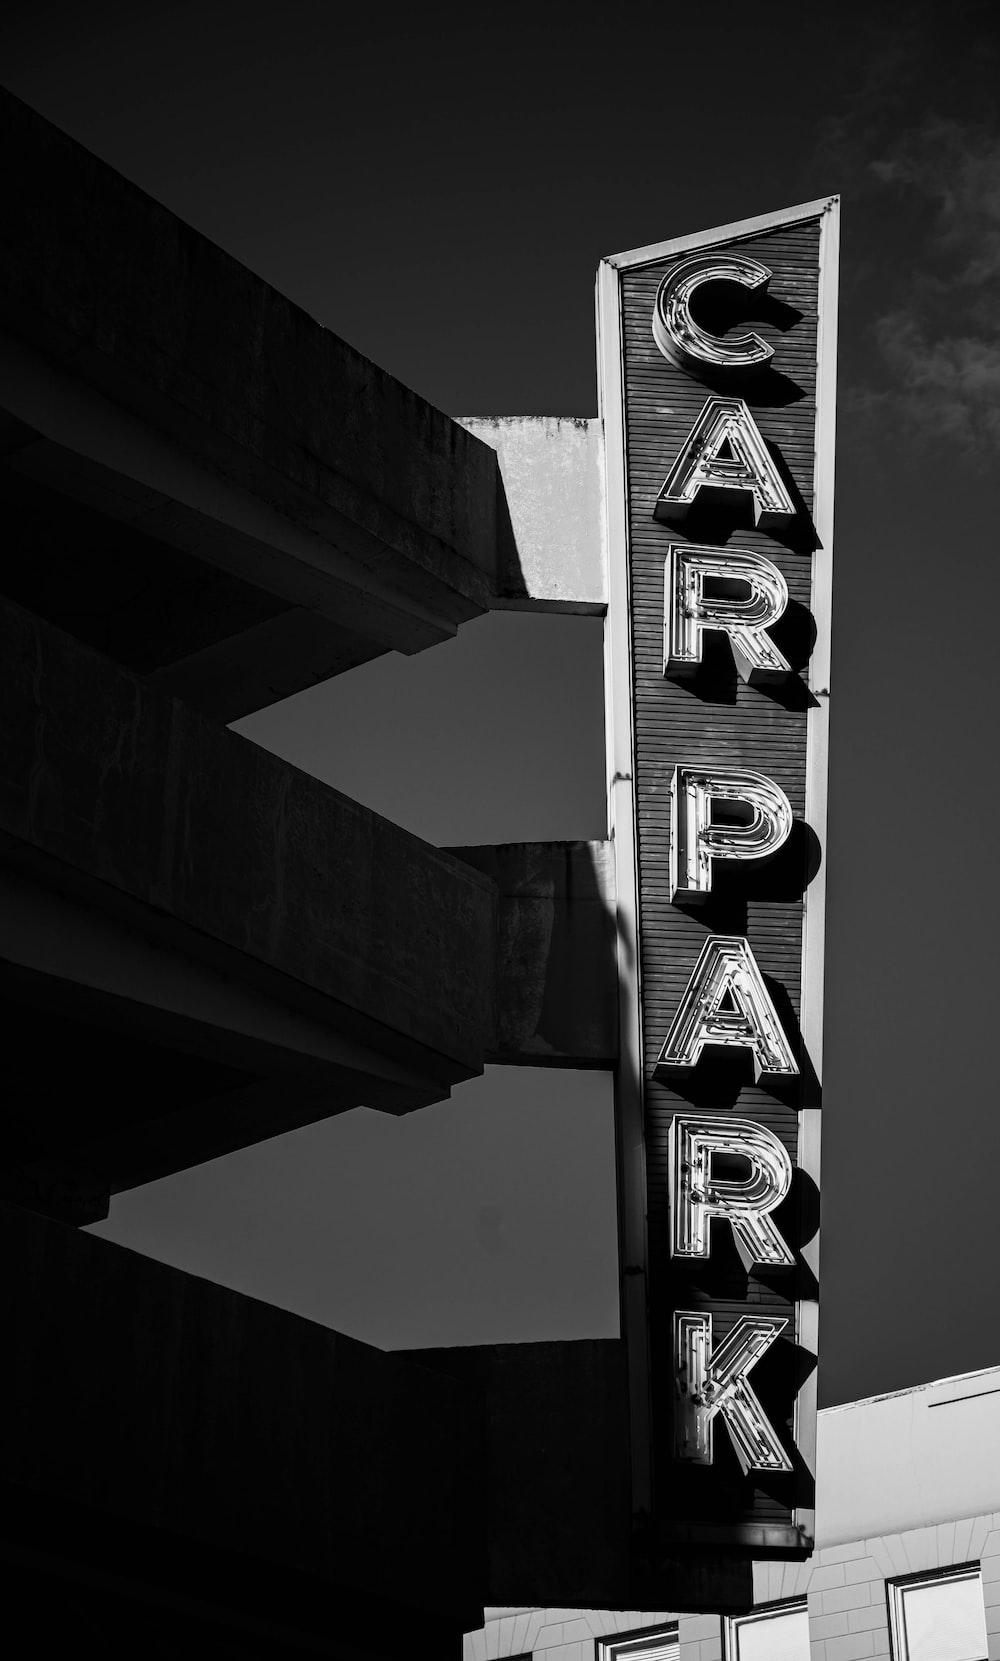 greyscale photography of car park signage